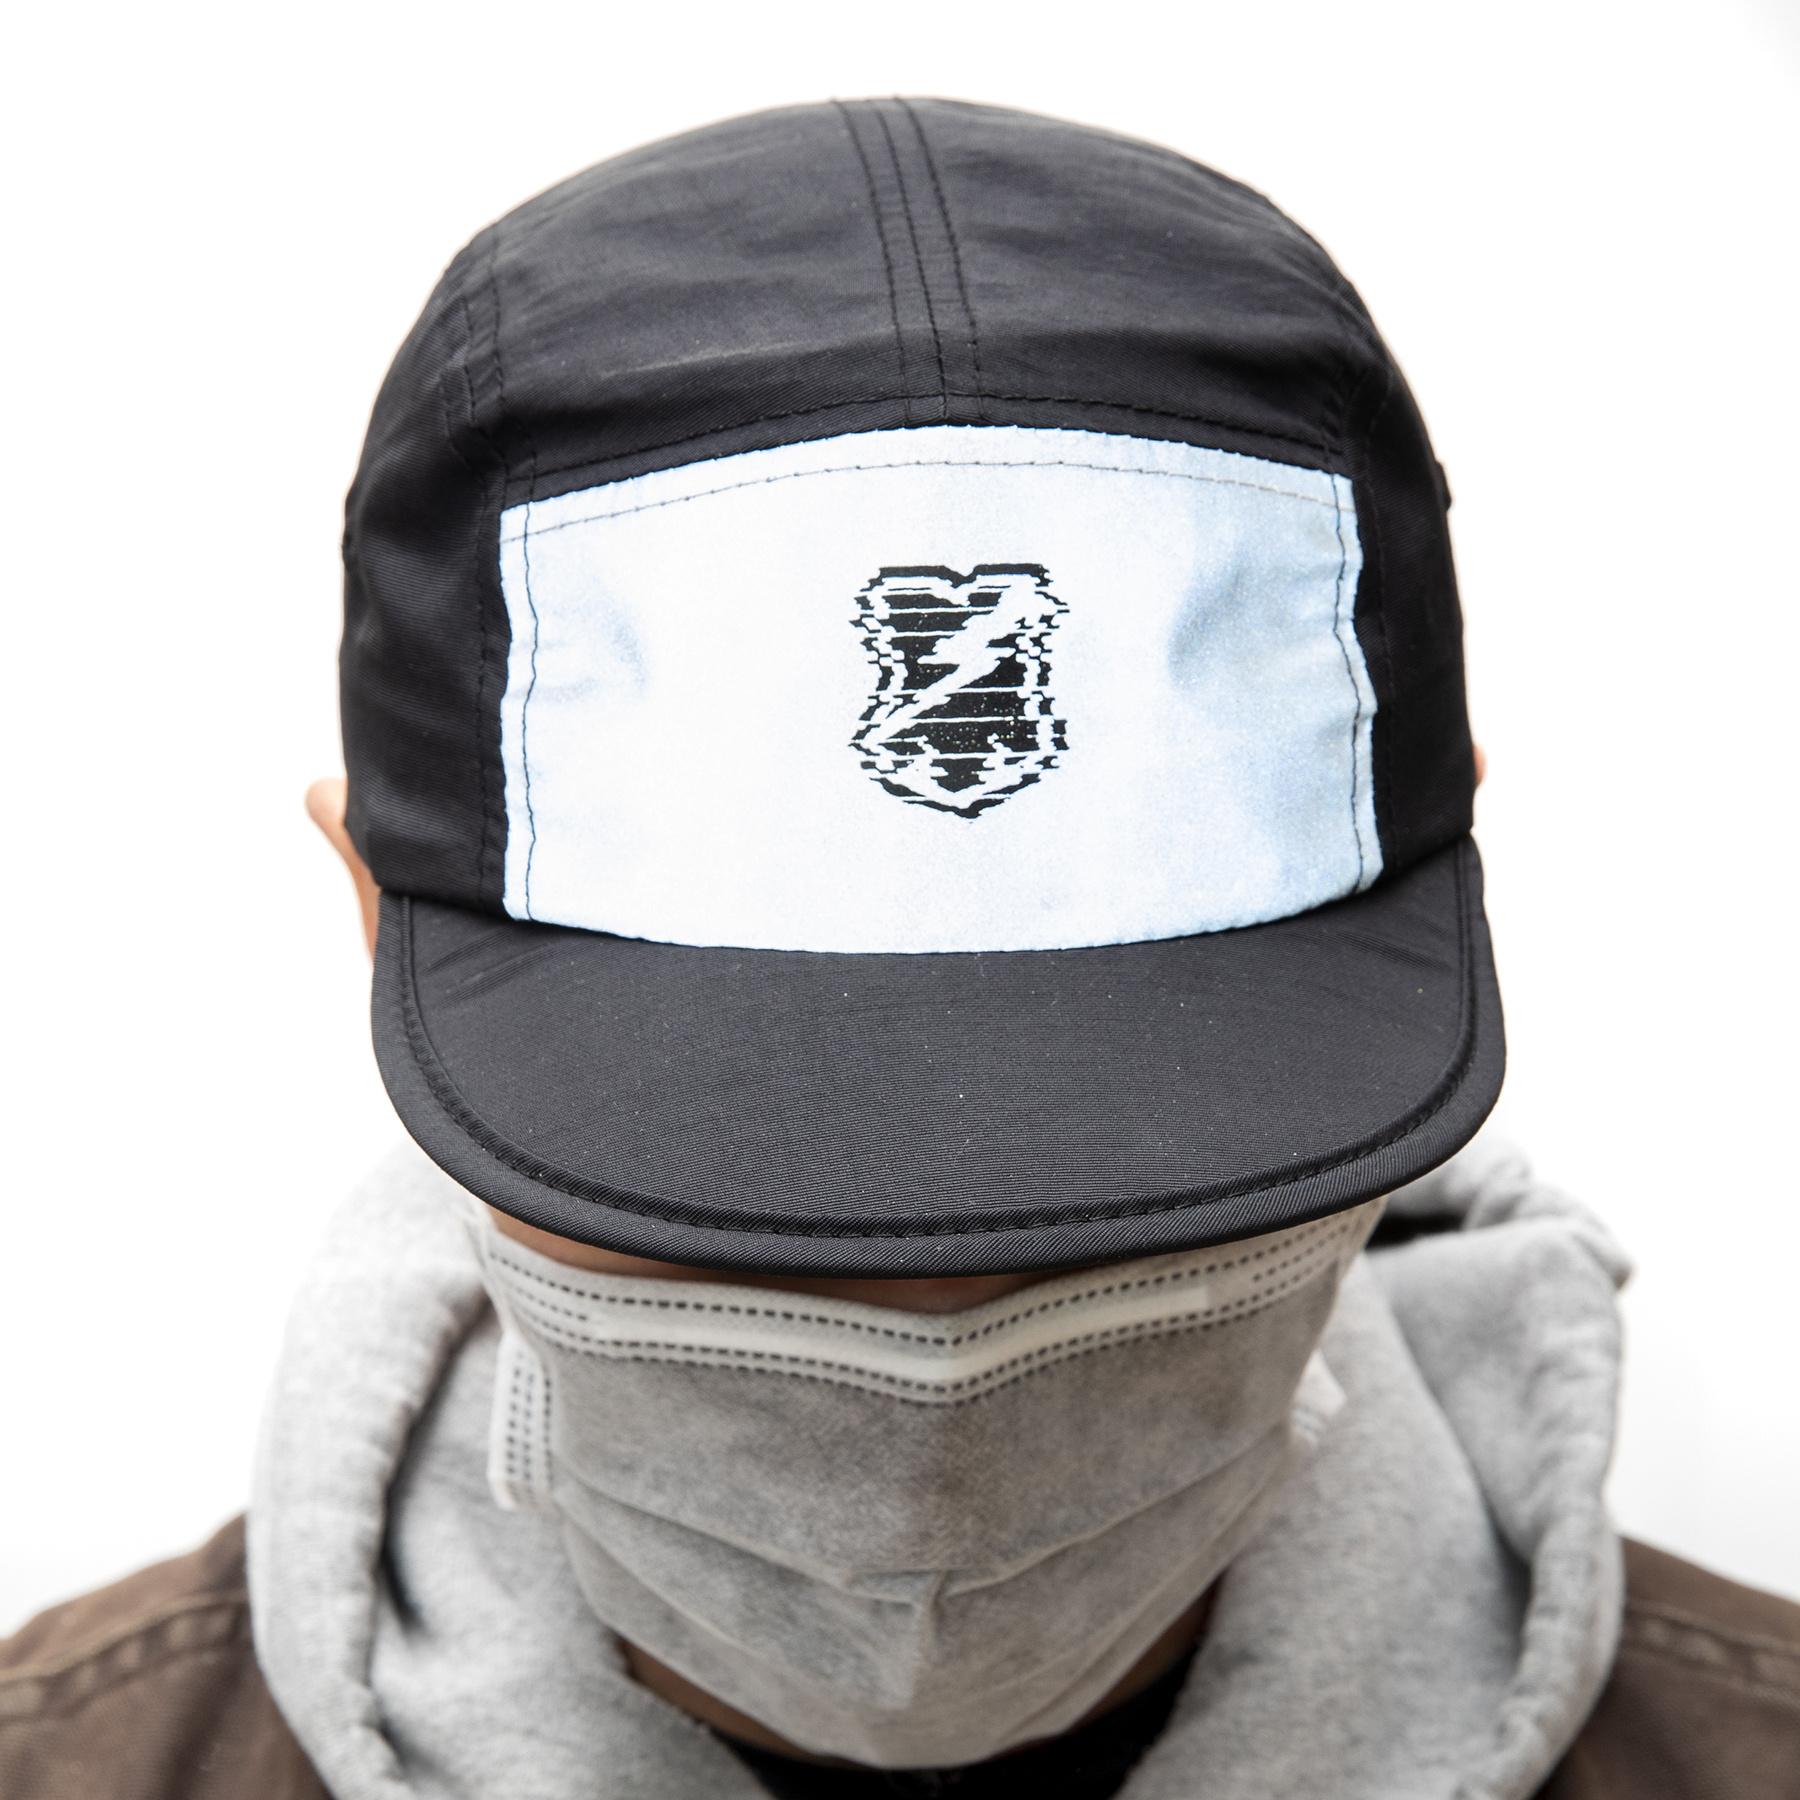 MASH Foldable hat Black + 3M Reflective